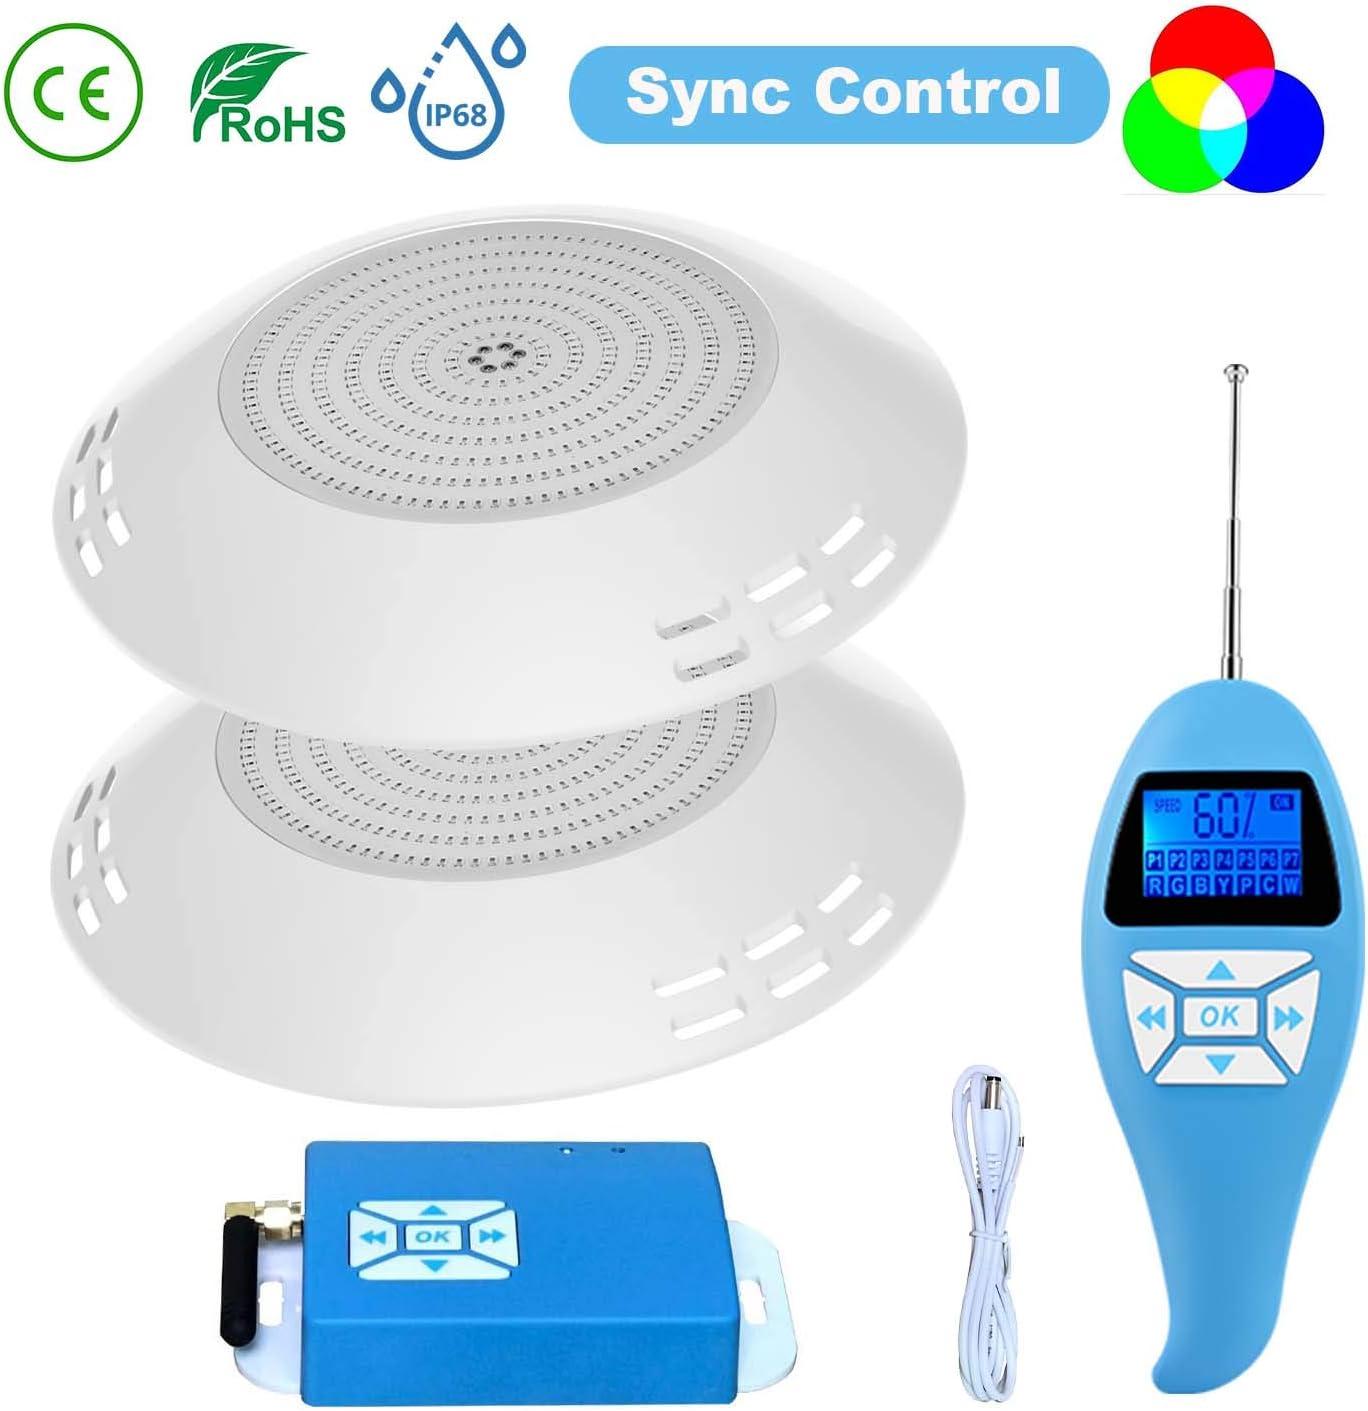 LyLmLe Foco LED Piscina Relleno de Resin, 35W Superficie extraplano RGB Multicolor Lámpara Sincronizador externo con Remoto,IP68 Impermeable,12V AC(2 Focos)